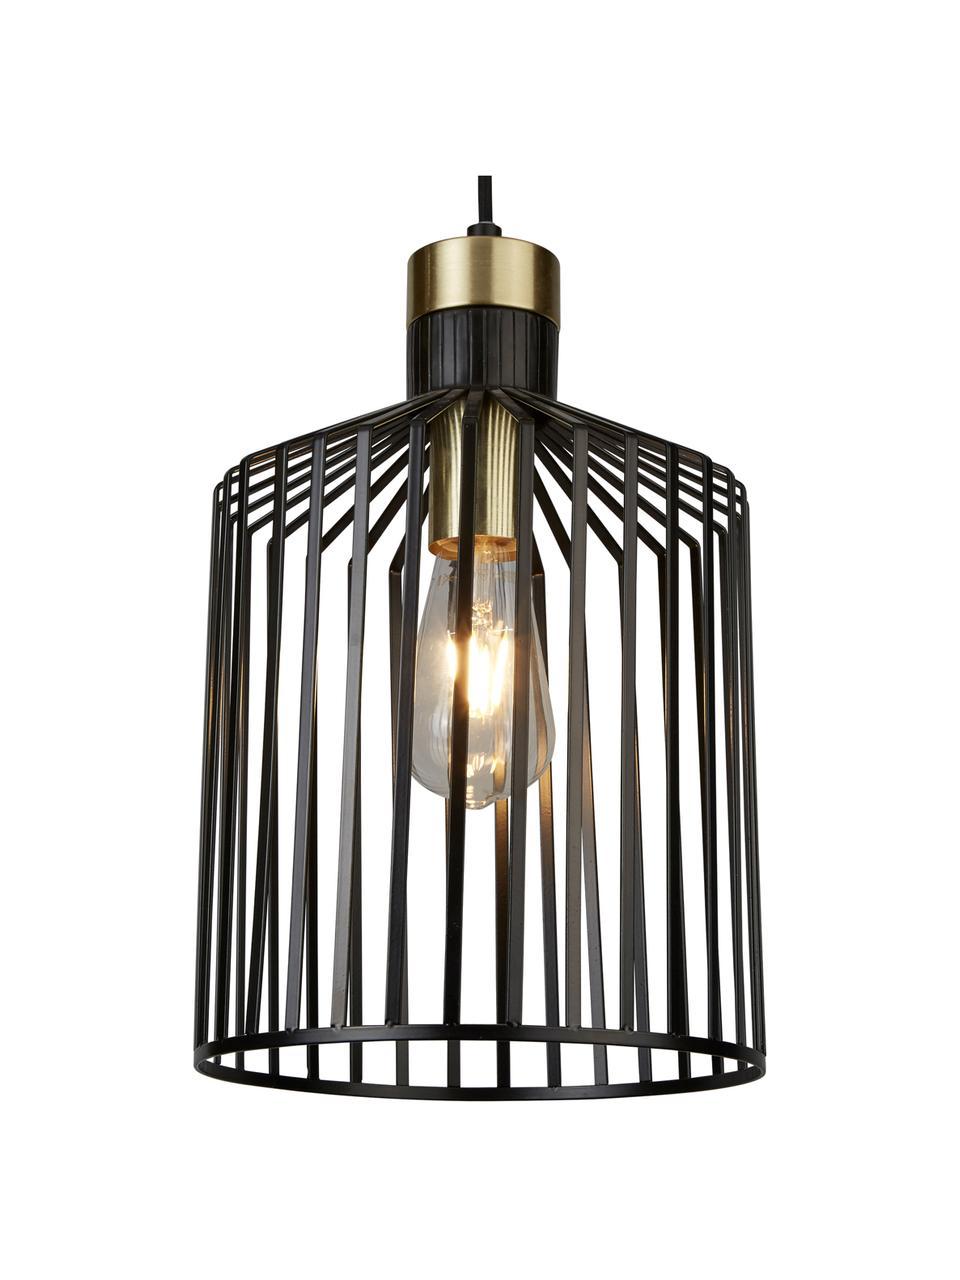 Lampada a sospensione in metallo Bird Cage, Paralume: metallo rivestito, Decorazione: metallo rivestito, Baldacchino: metallo rivestito, Nero, dorato, Ø 22 x Alt. 36 cm